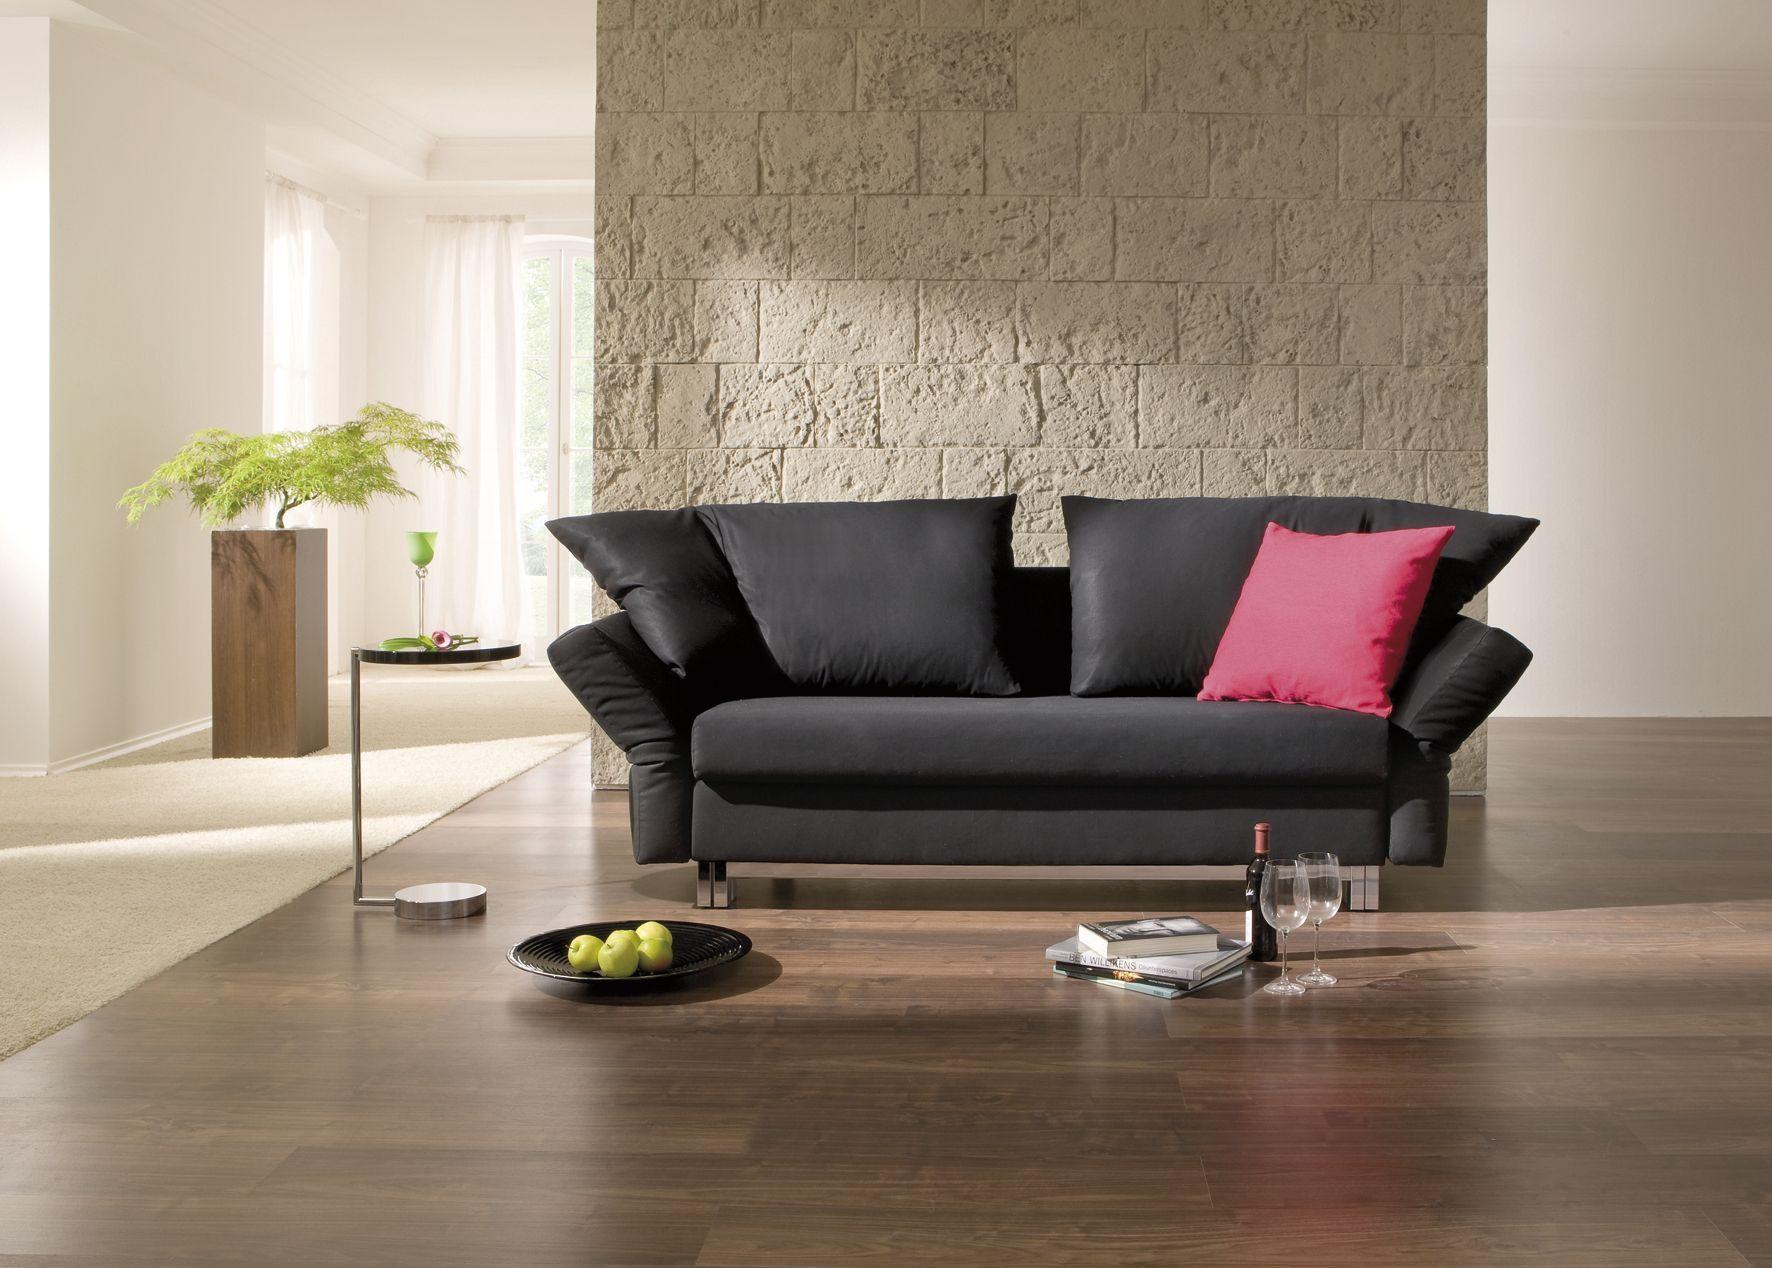 cool sofa design comtemporary best sofas black sofas ideas furniture inspiration